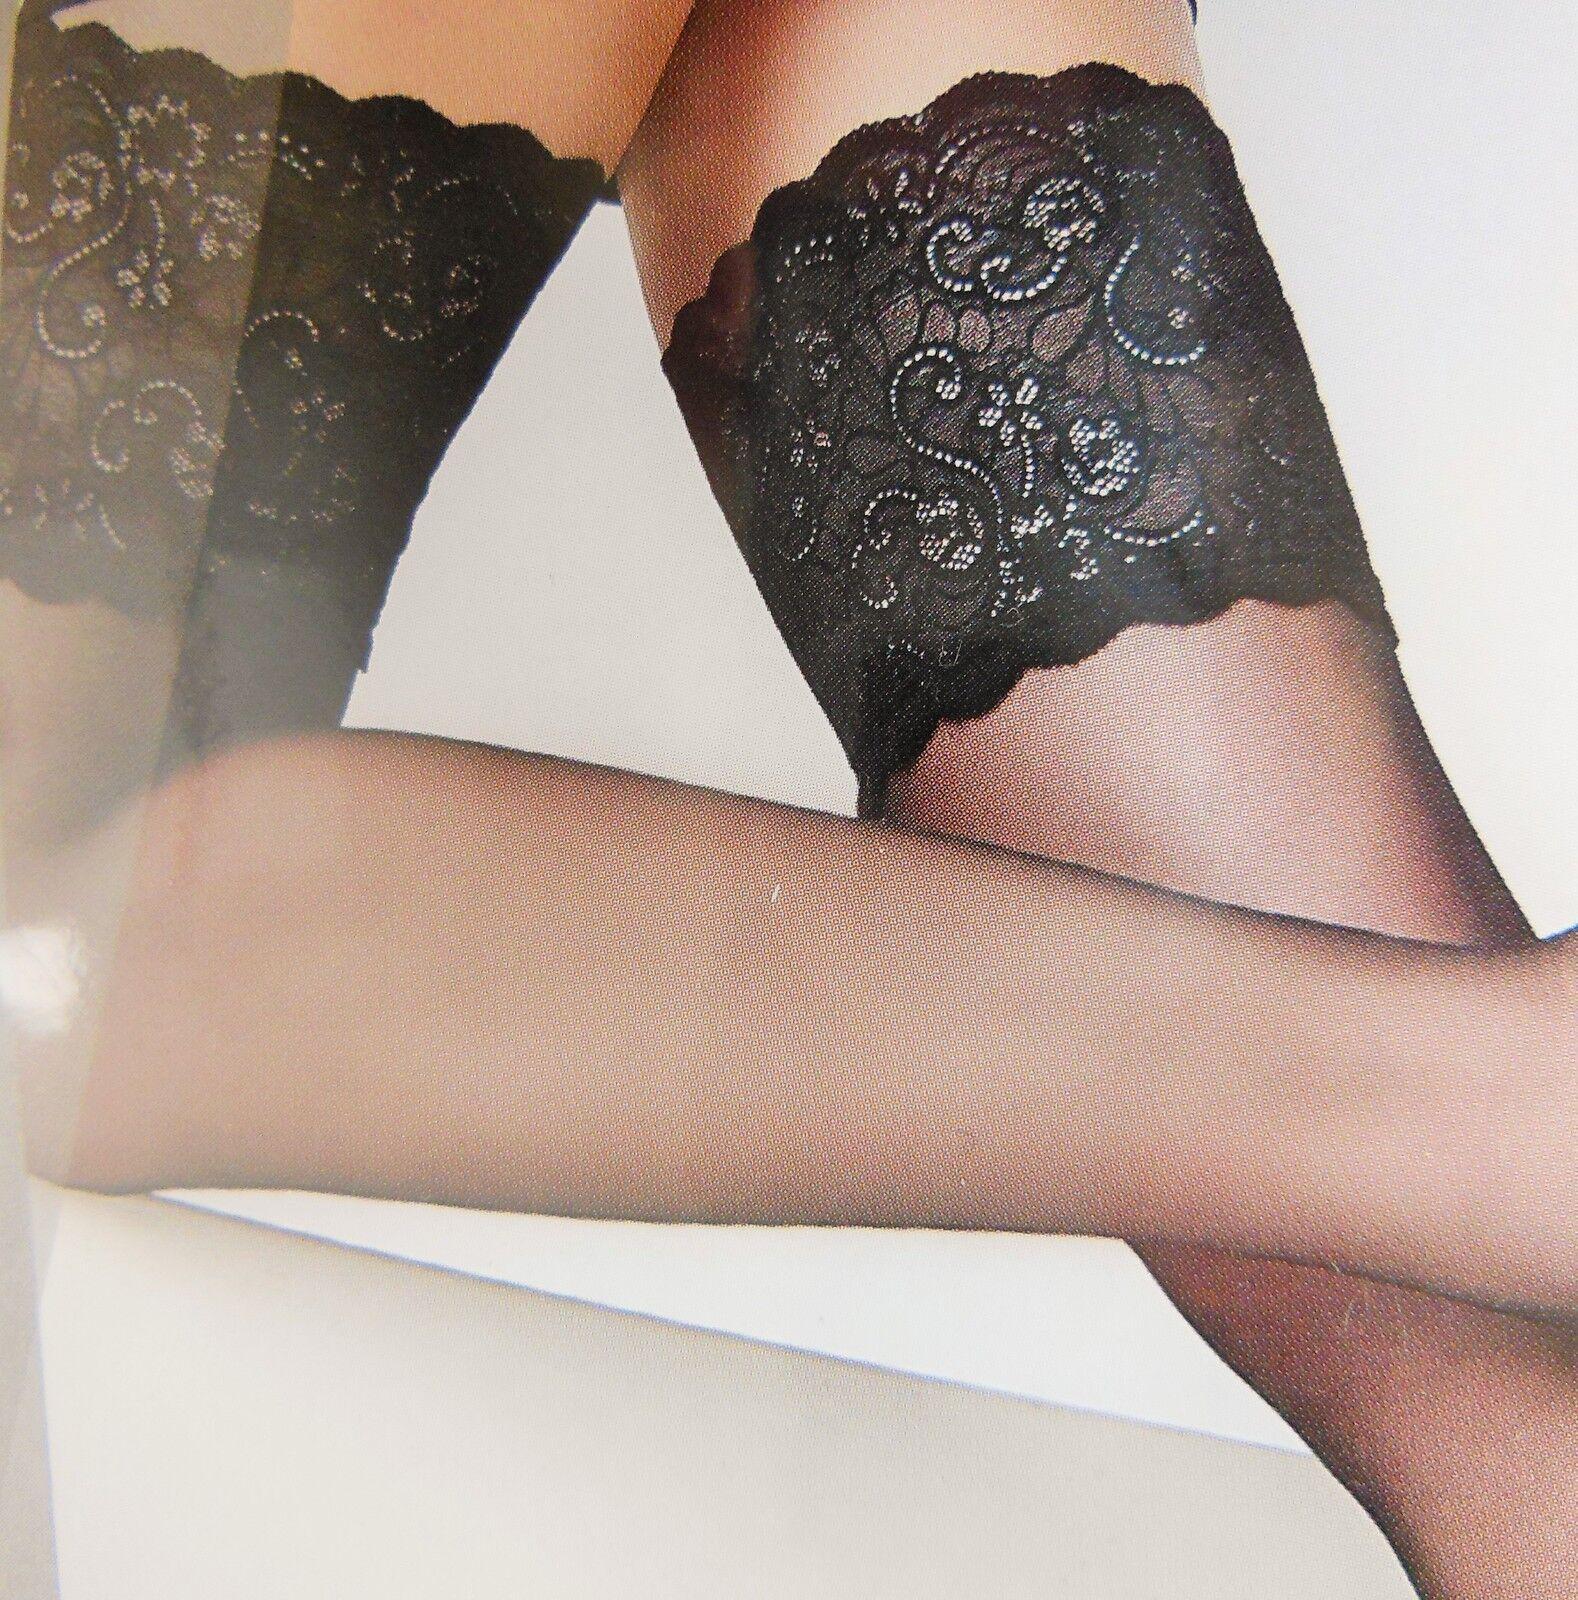 NAOMI BAS von Cecilia de Rafael | exklusive halterlose Strümpfe | breite Spitze